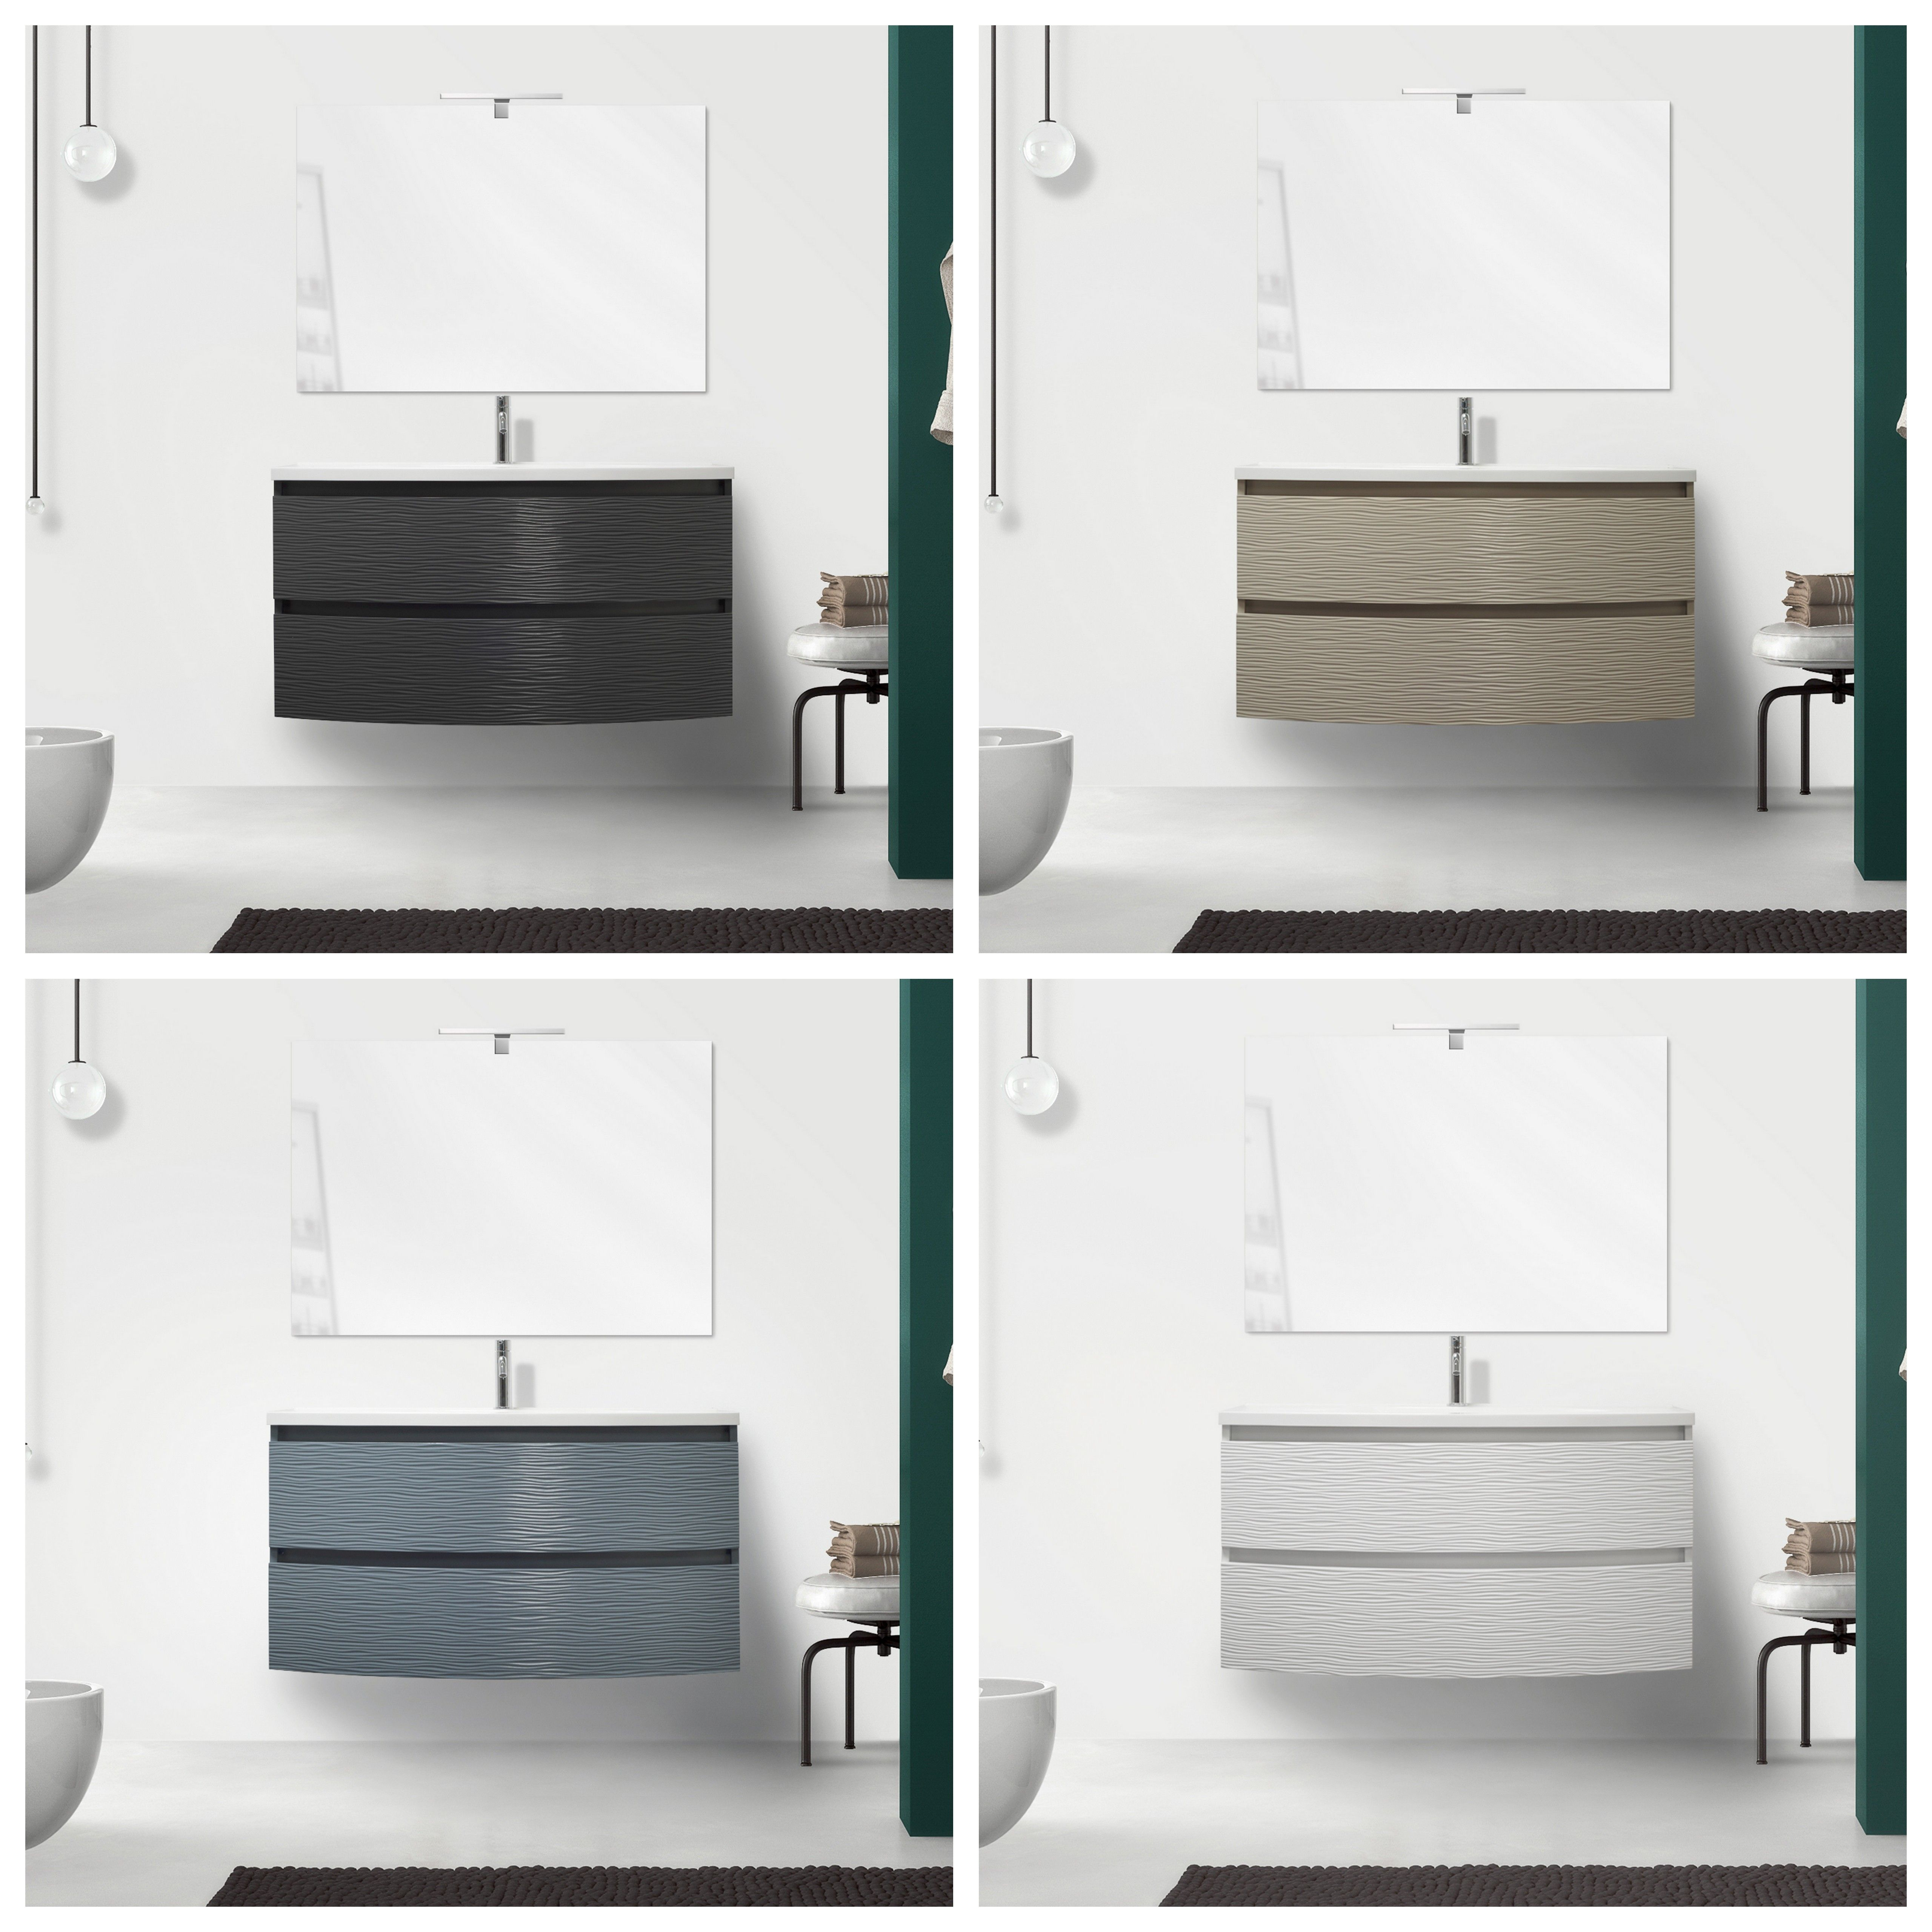 Mobile bagno curvet 80 o 100 cm 2 cassetti lavabo in - Mobile bagno 80 ...